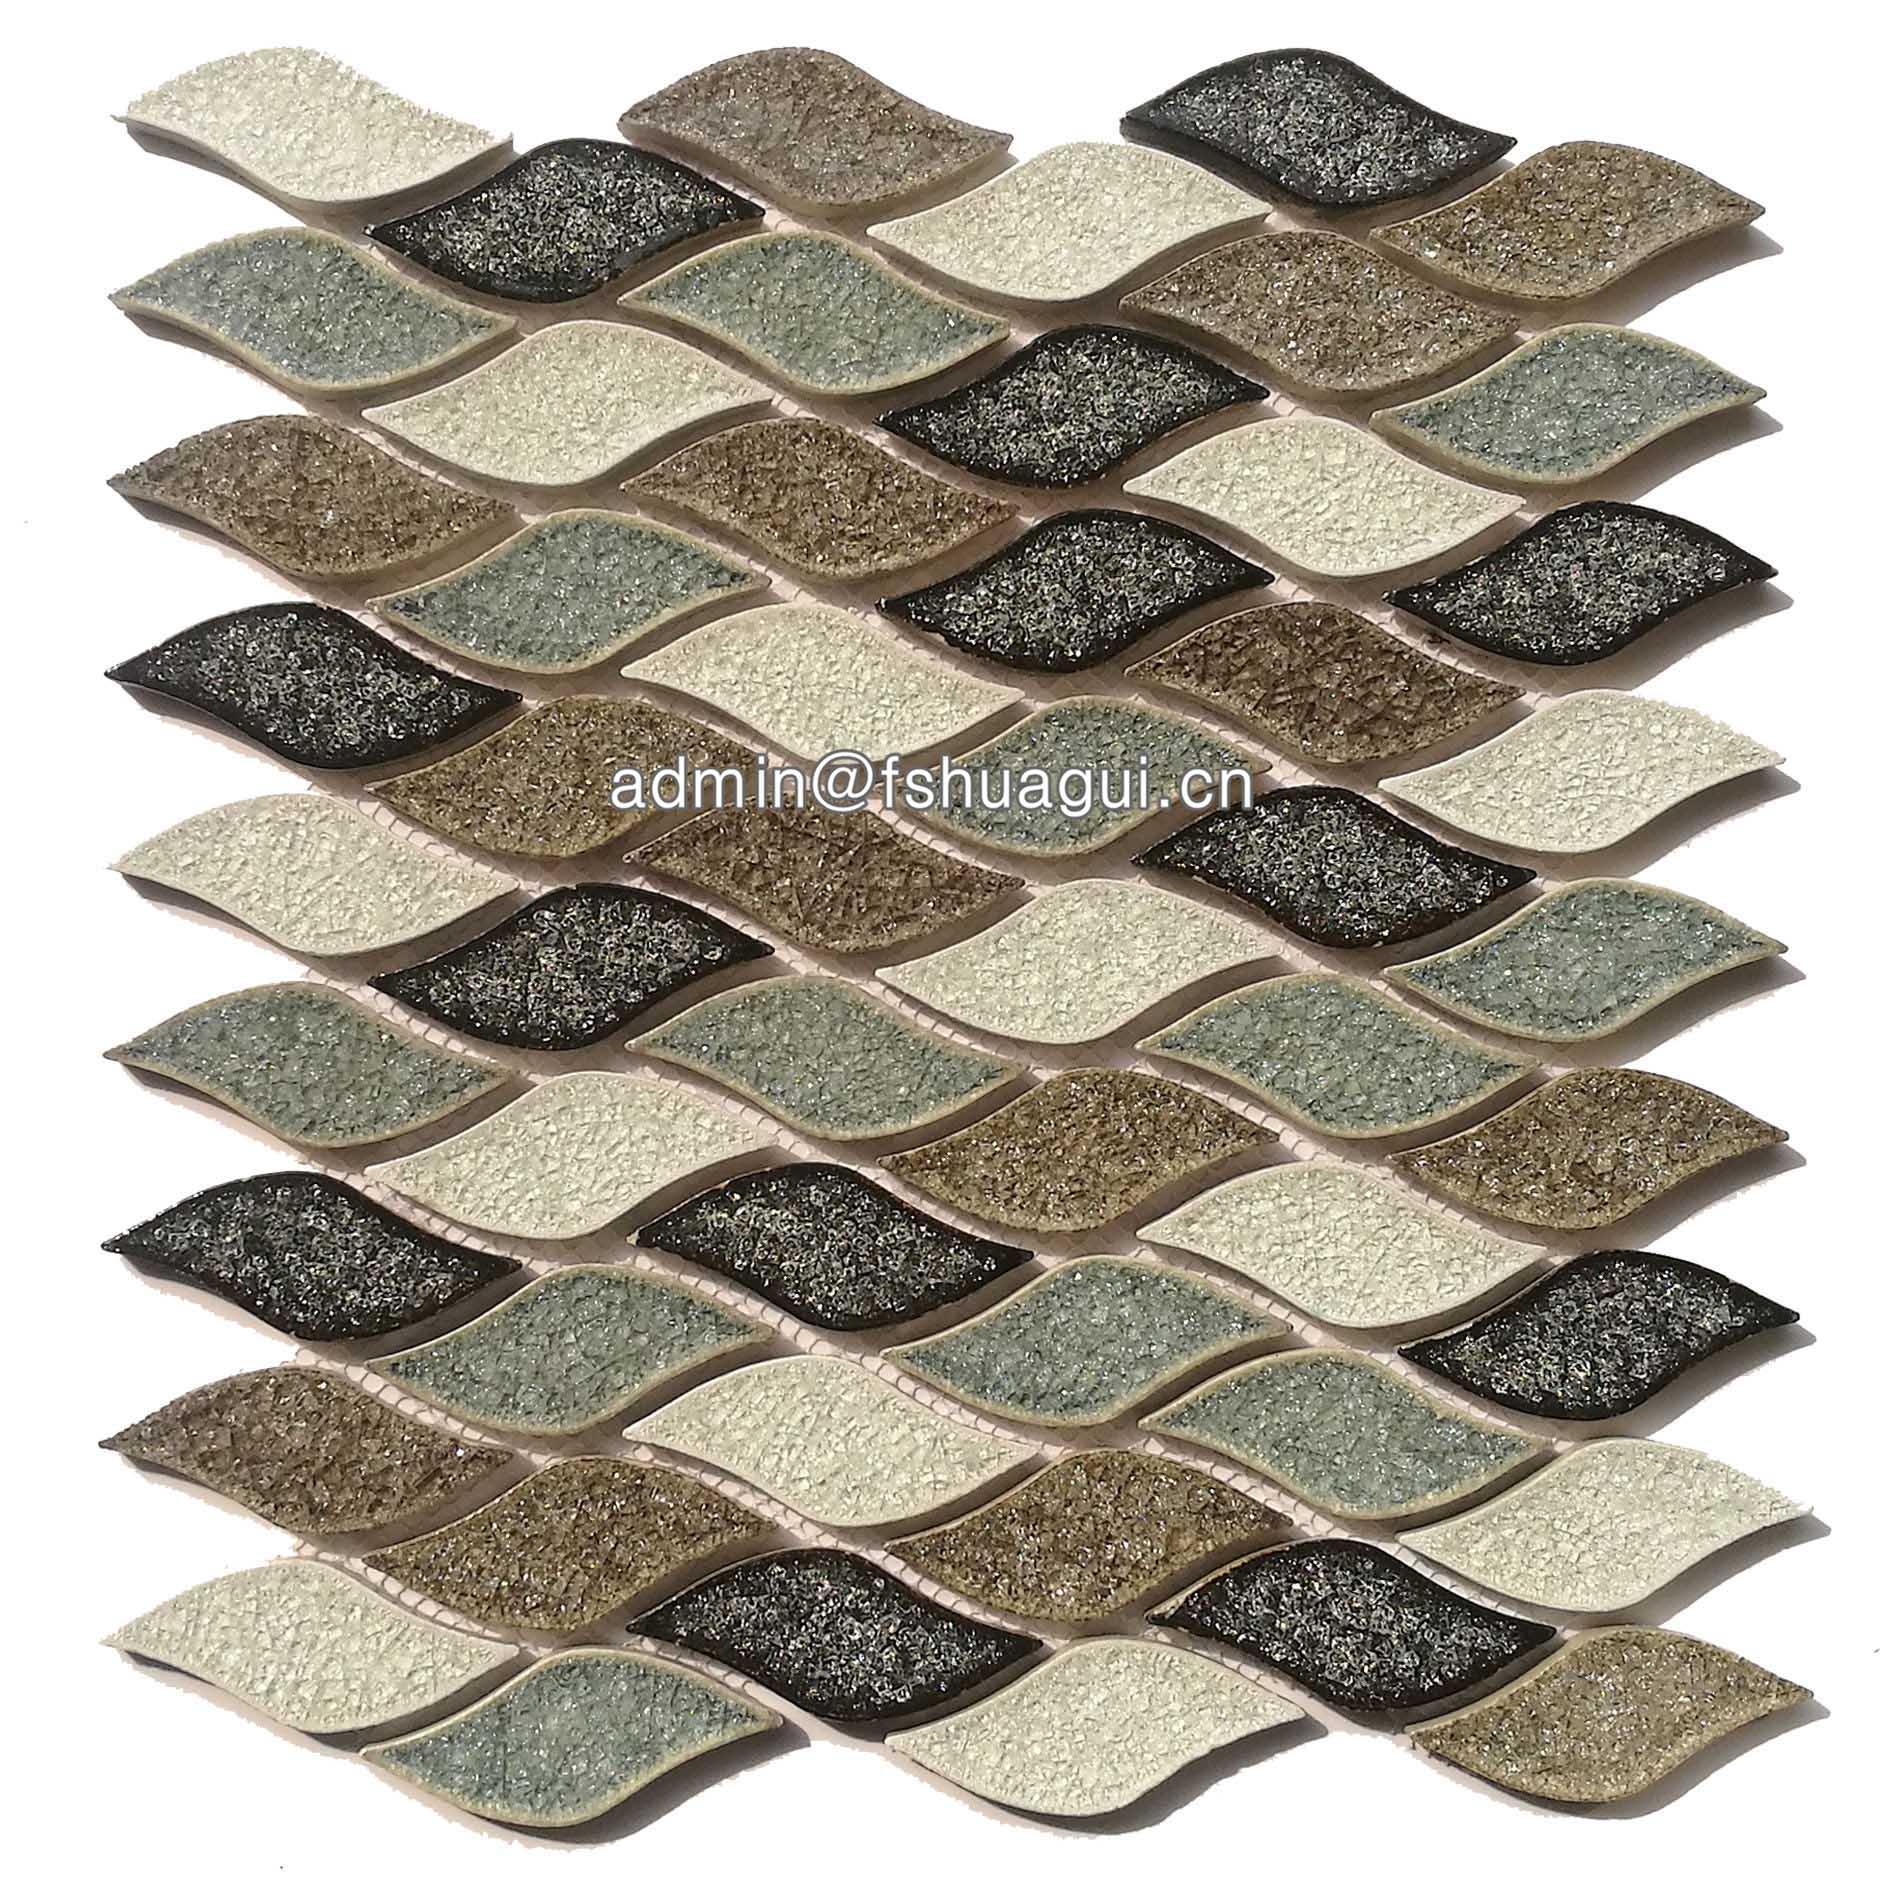 Huagui Ceramic mosaic tile HG-IC004 CERAMIC MOSAIC TILE image10